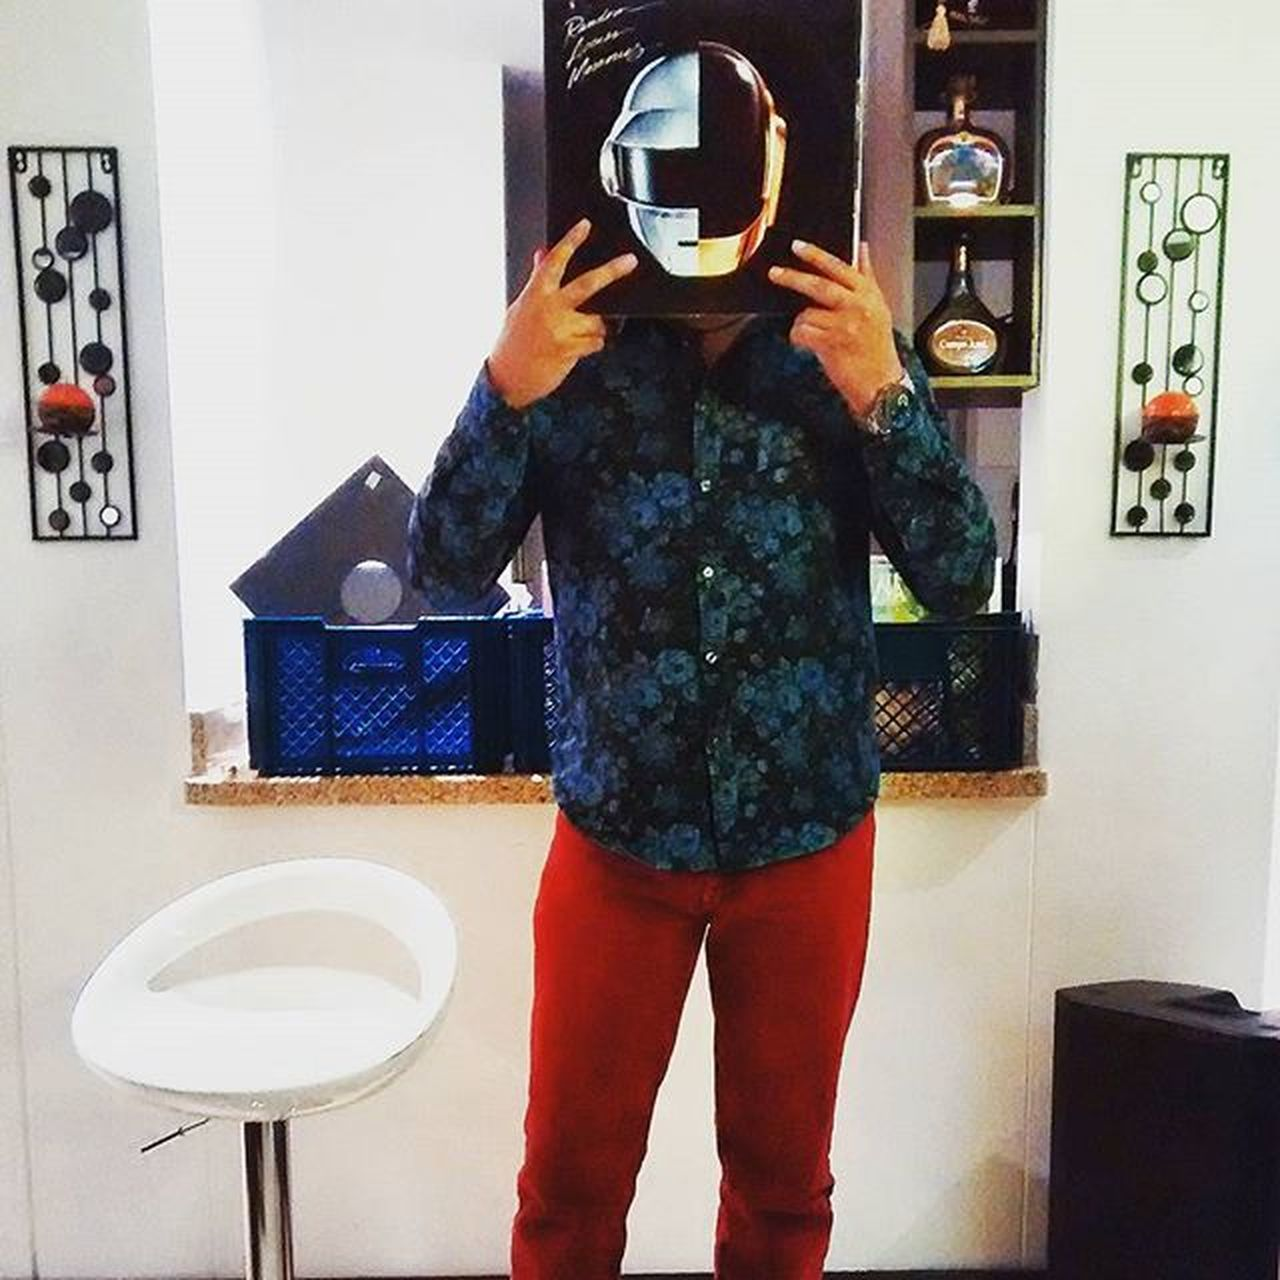 RAM RandoAccesMemorie Daftpunk  GratAlbum GiorgioMoroder